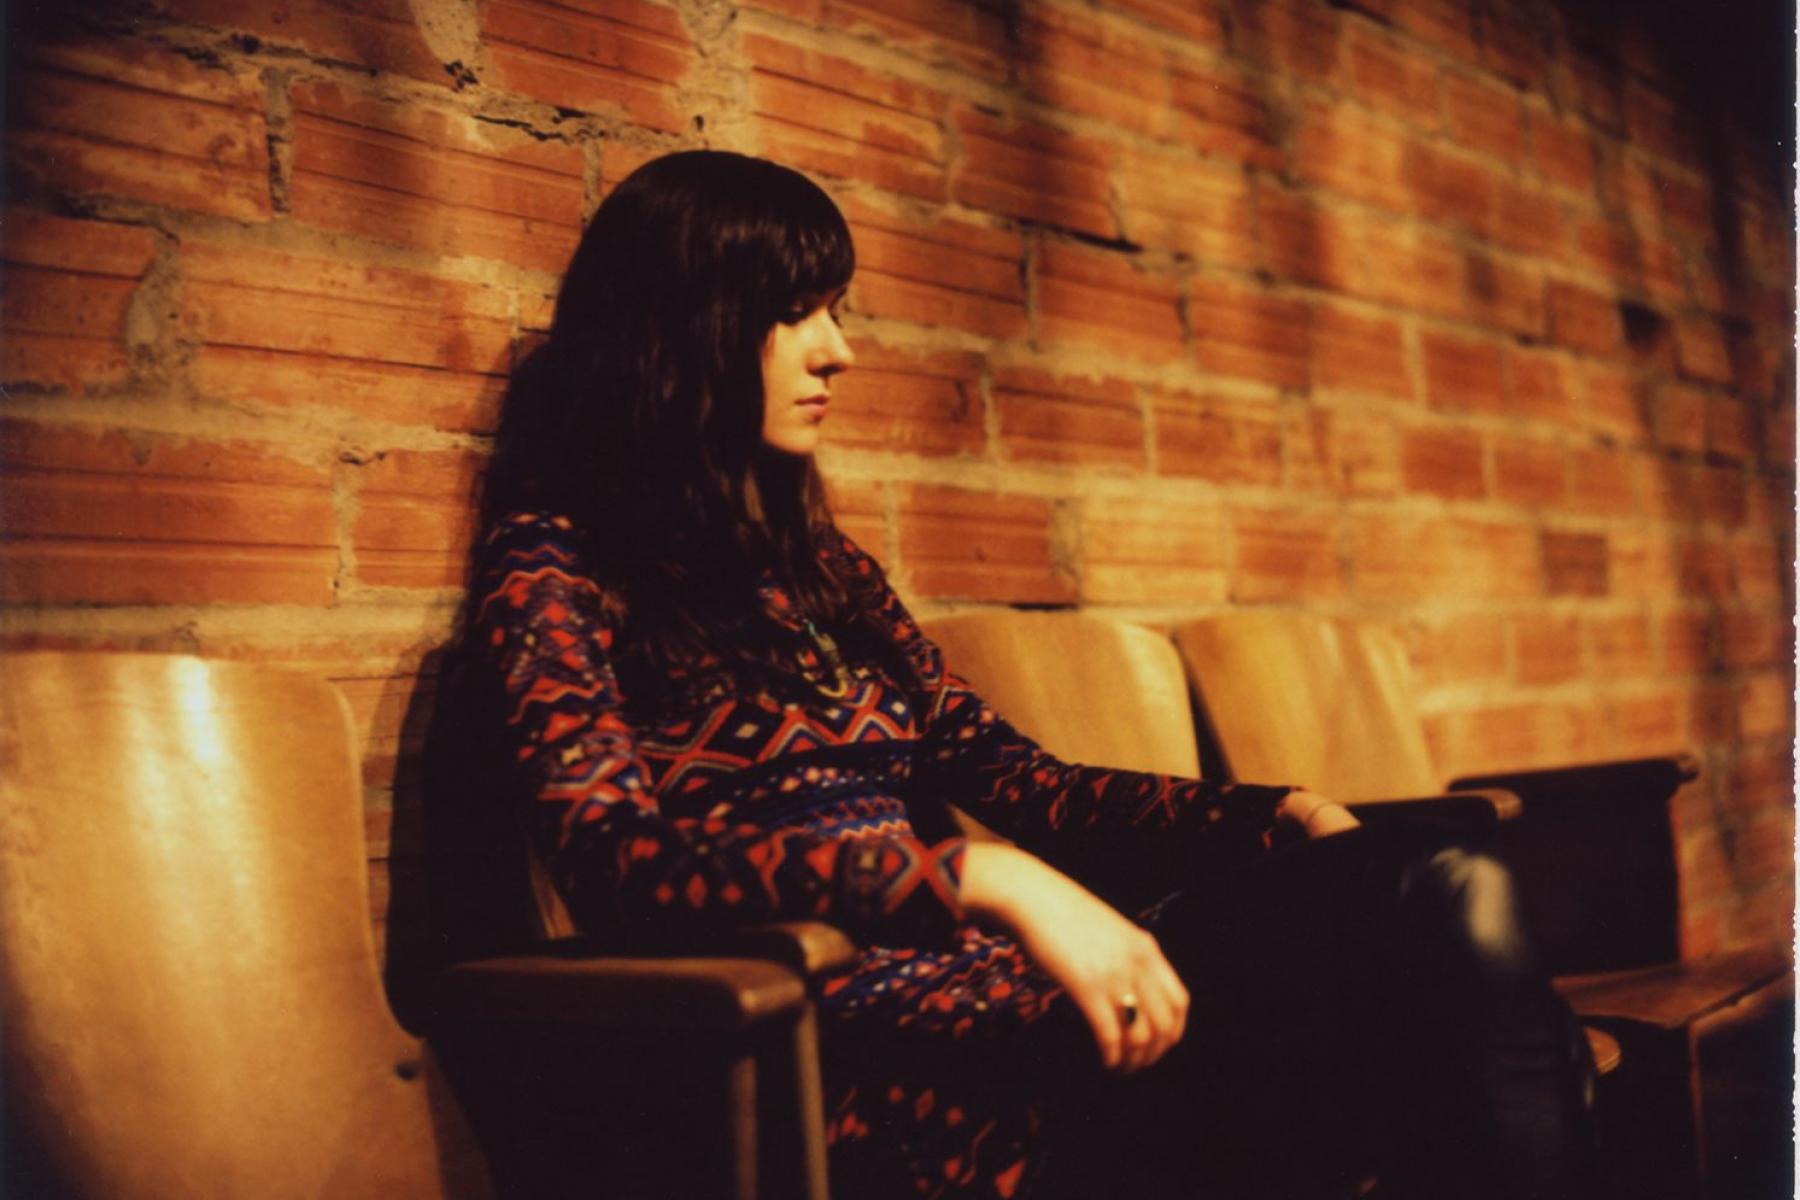 Sarah Lipstate, 30 December 2012. Photo by Alex Marks.